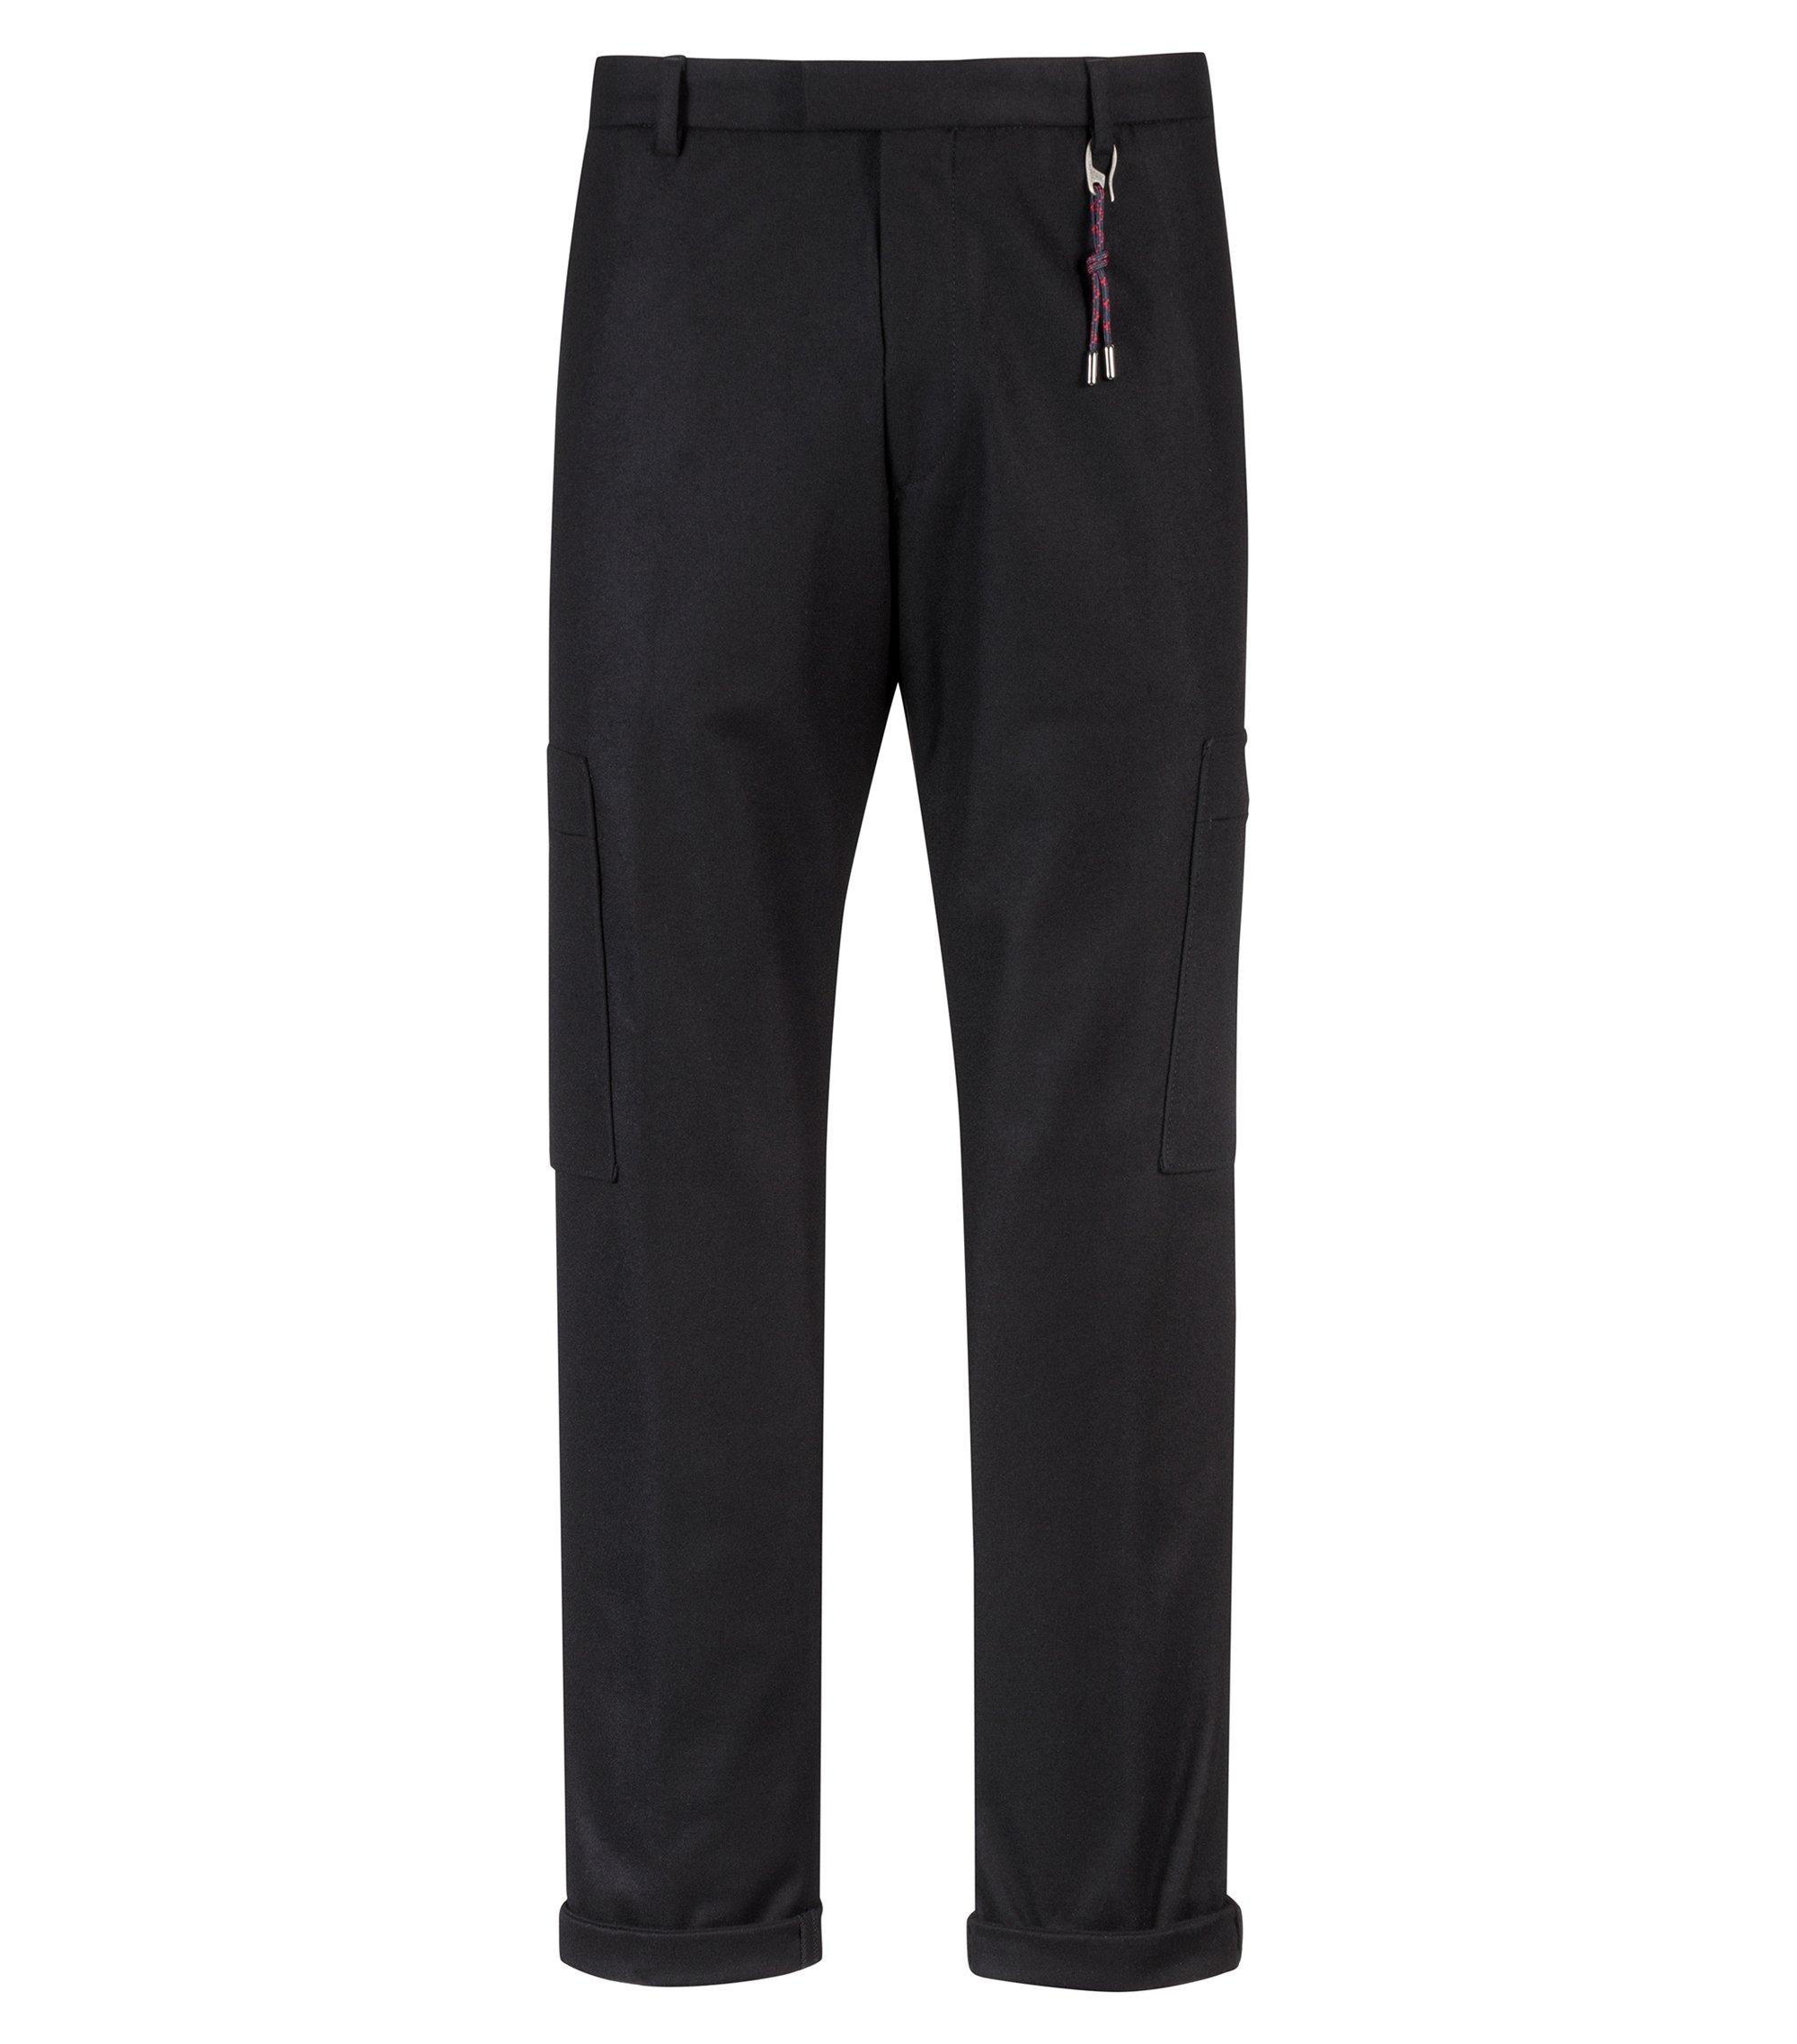 Slim-fit pants in a felt-effect wool blend, Black